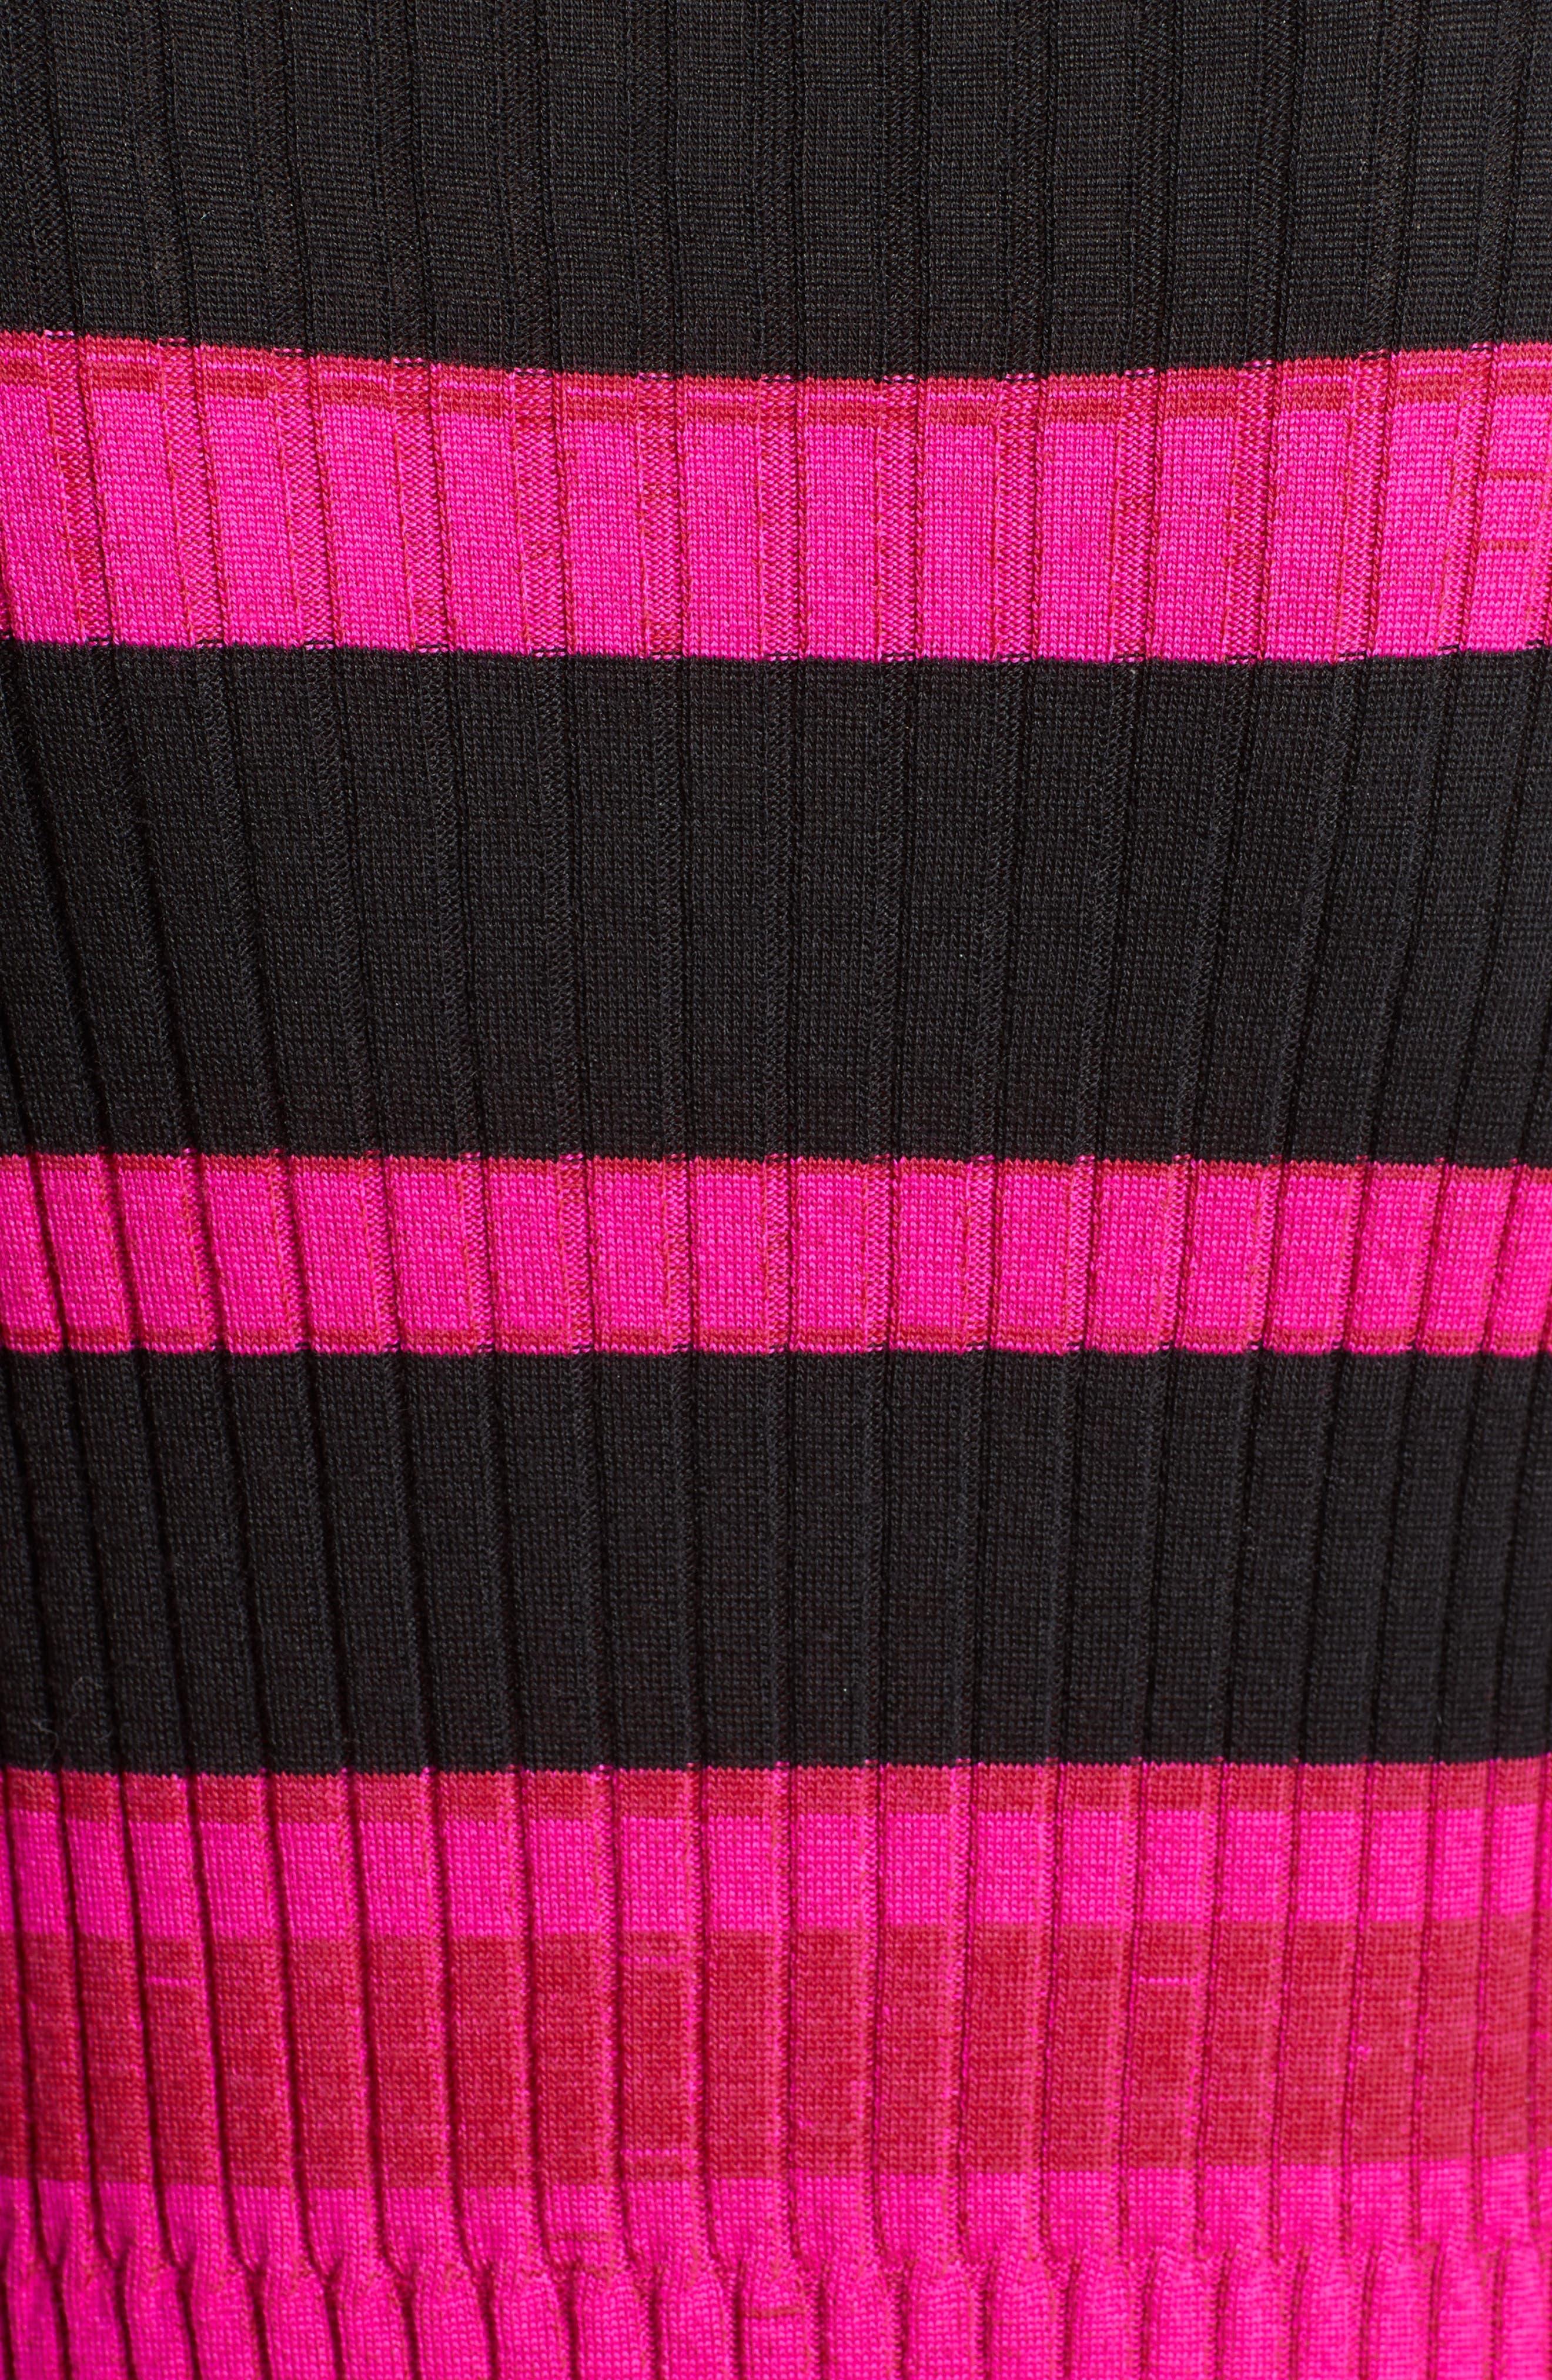 Stripe Cashmere, Wool & Silk Midi Dress,                             Alternate thumbnail 5, color,                             650